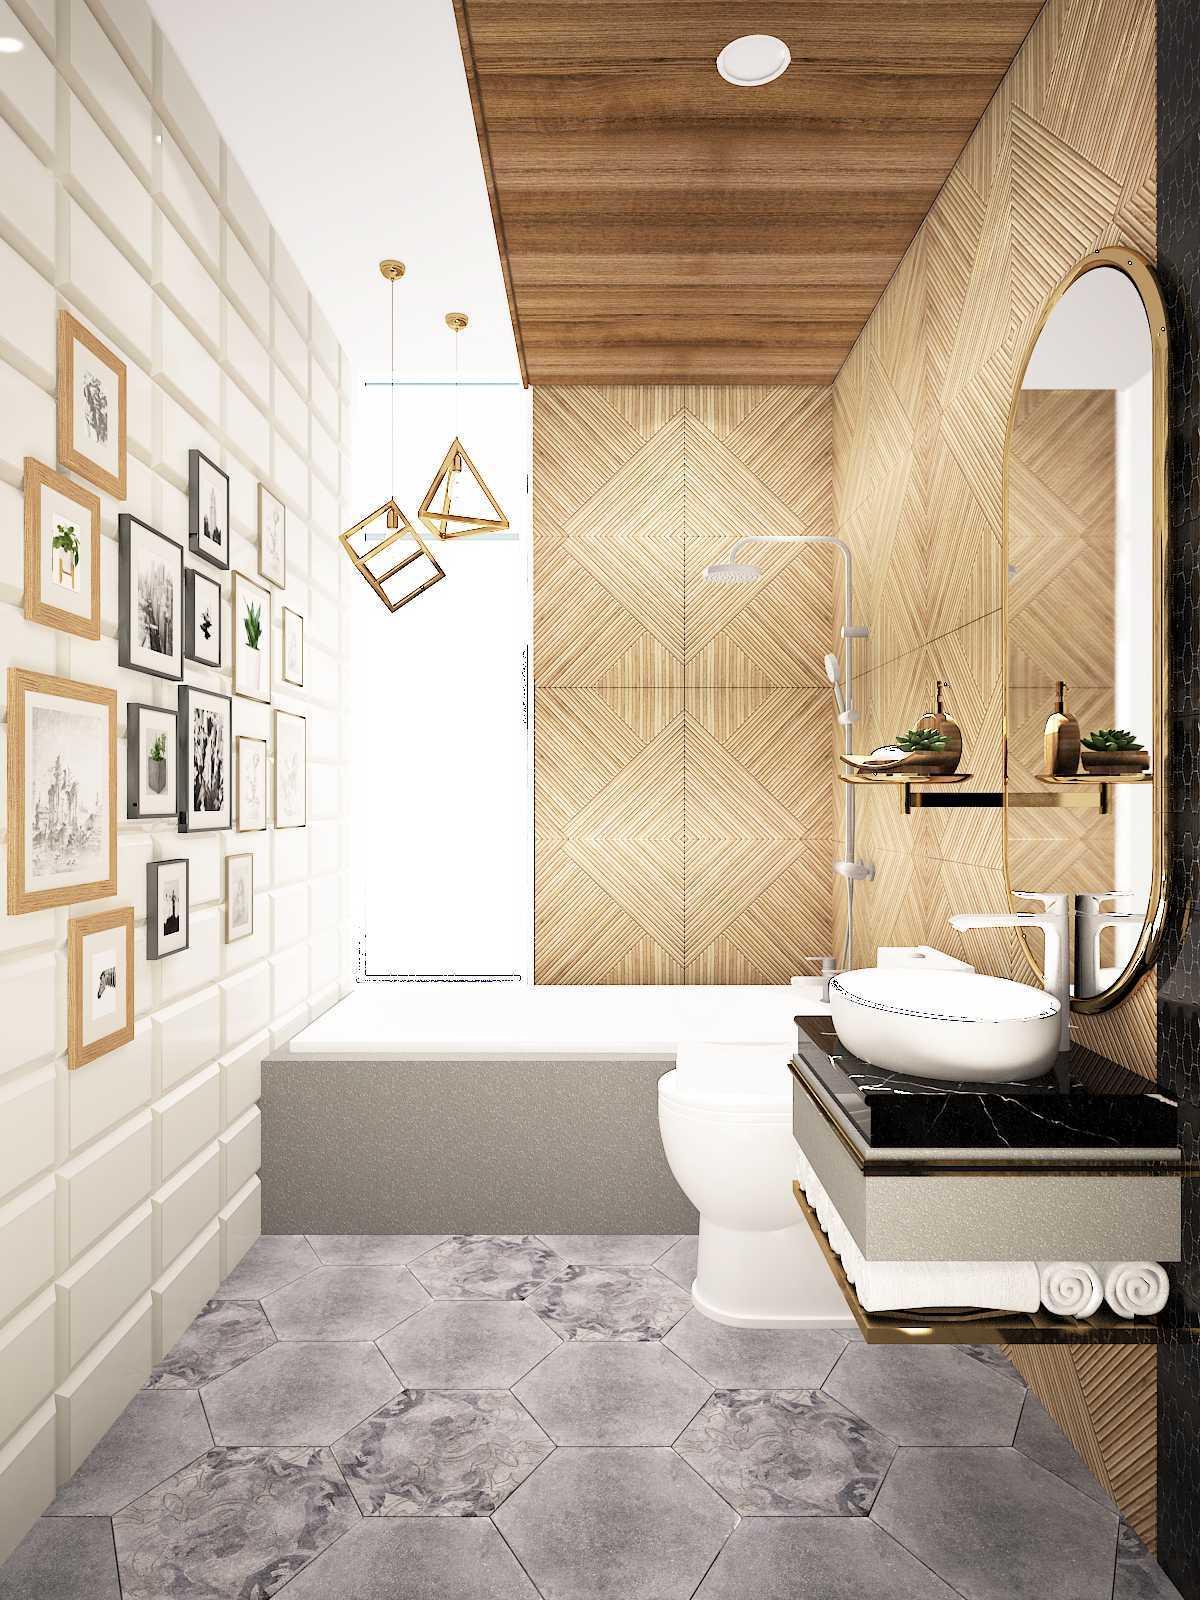 "Arianiz Studio Mr. Royan Bathroom Bukit Sari Jl. Ki Mangunsarkoro No.16, Karangkidul, Kec. Semarang Tengah, Kota Semarang, Jawa Tengah 50241, Indonesia Jl. Ki Mangunsarkoro No.16, Karangkidul, Kec. Semarang Tengah, Kota Semarang, Jawa Tengah 50241, Indonesia Arianiz-Studio-Man-Bathroom  <P>R - ""man"" Bathroom</p> <P>Luas Area : 10 M2</p> 119941"